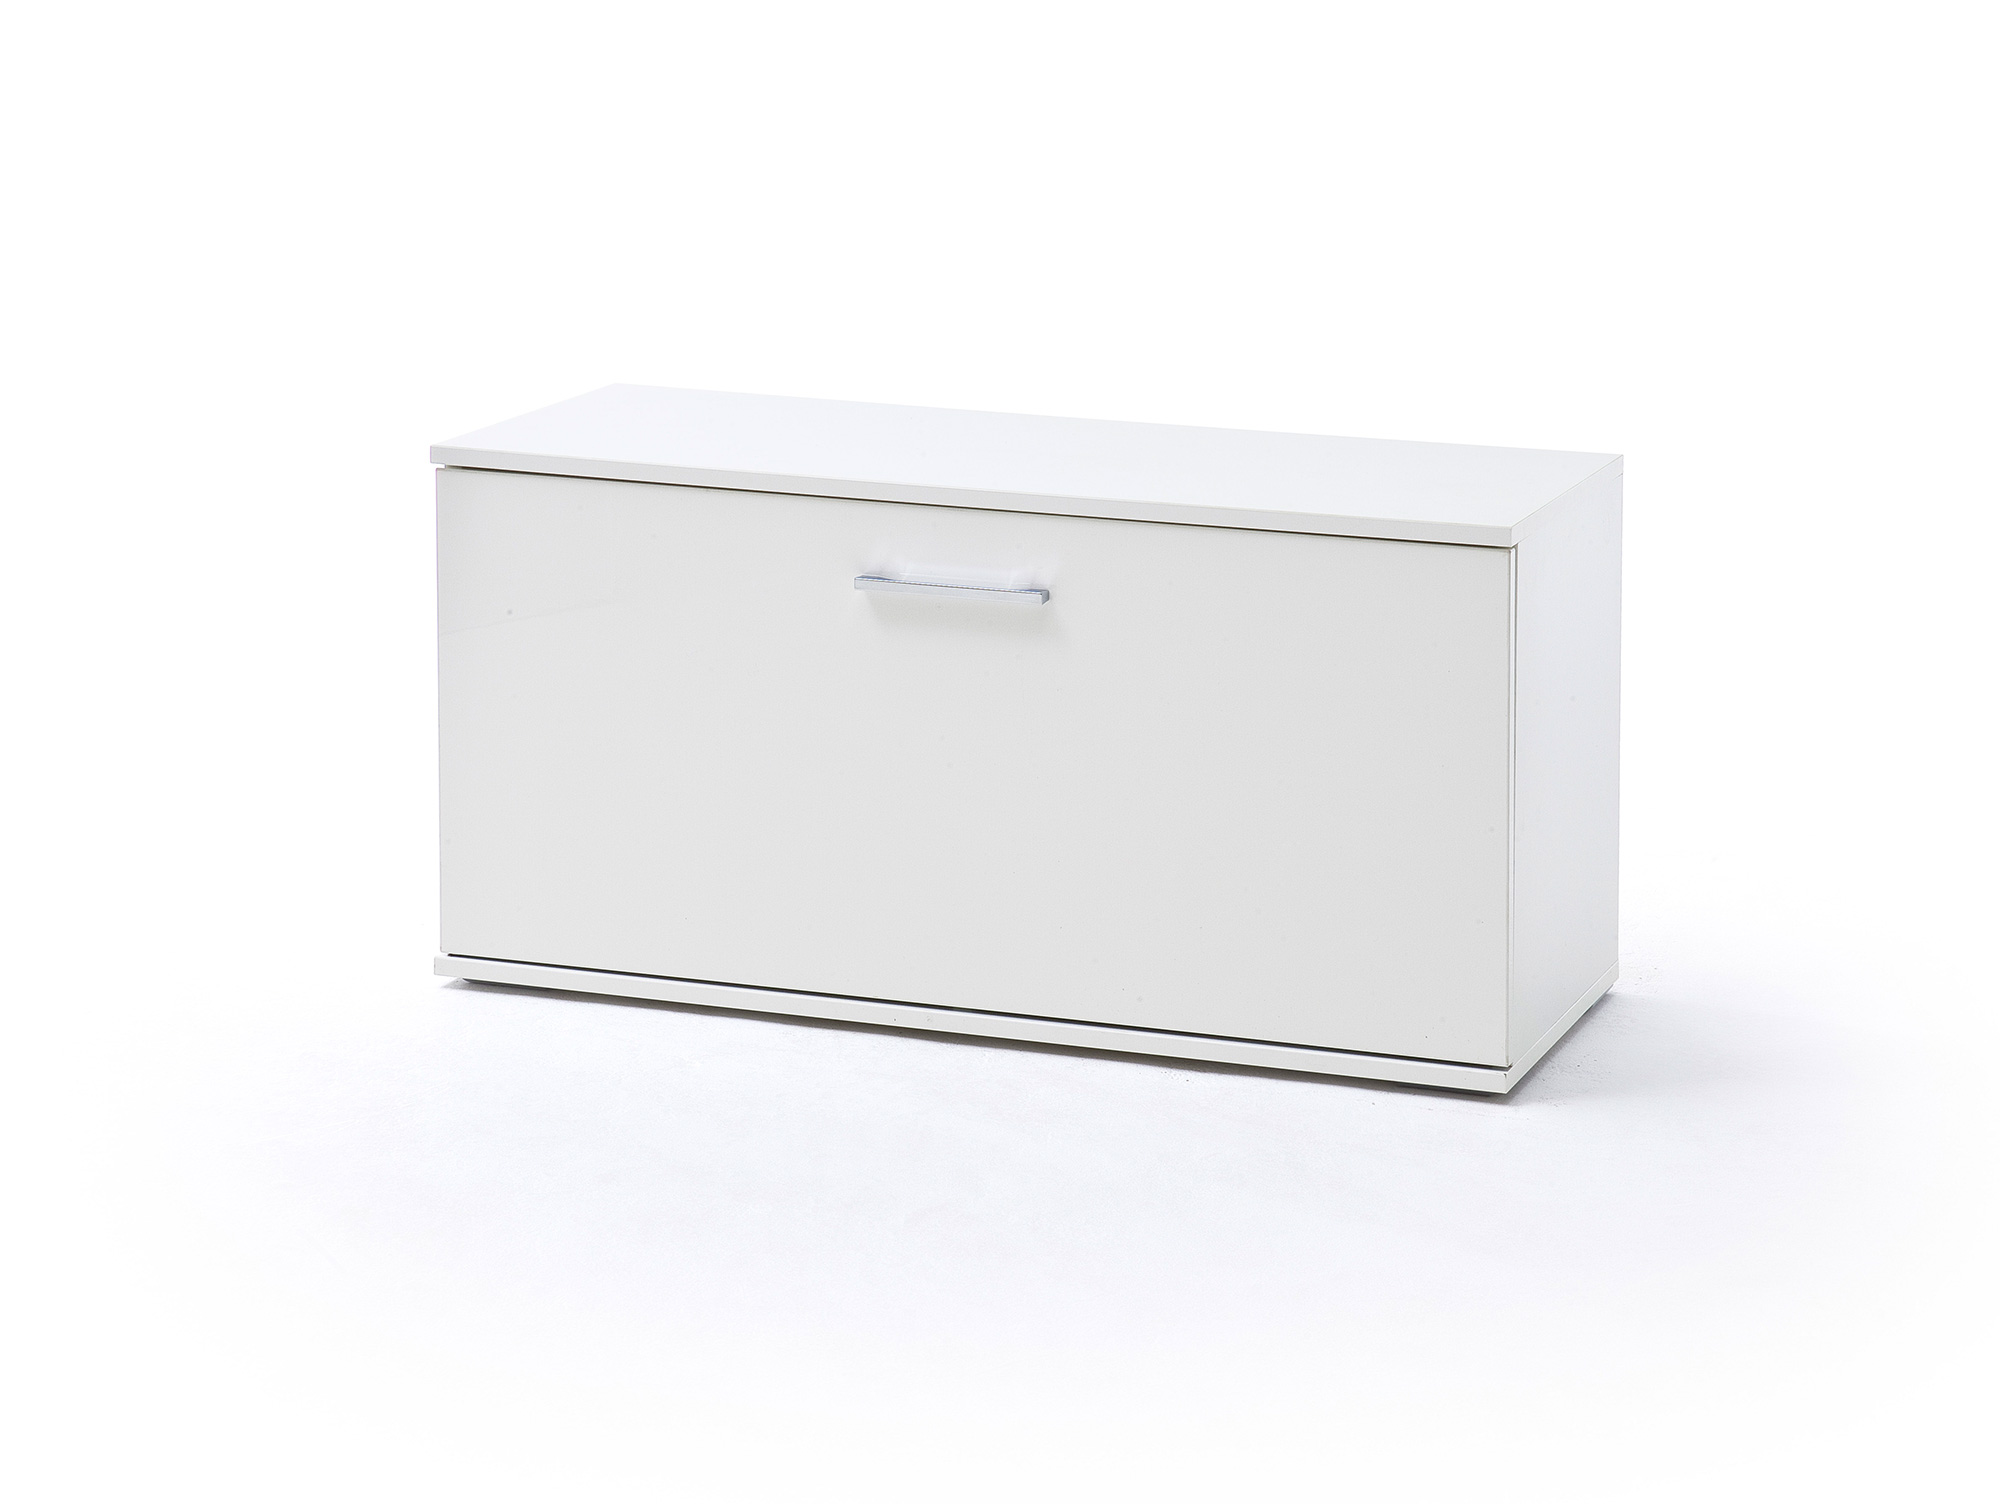 grazia garderobenbank weiss hochglanz. Black Bedroom Furniture Sets. Home Design Ideas